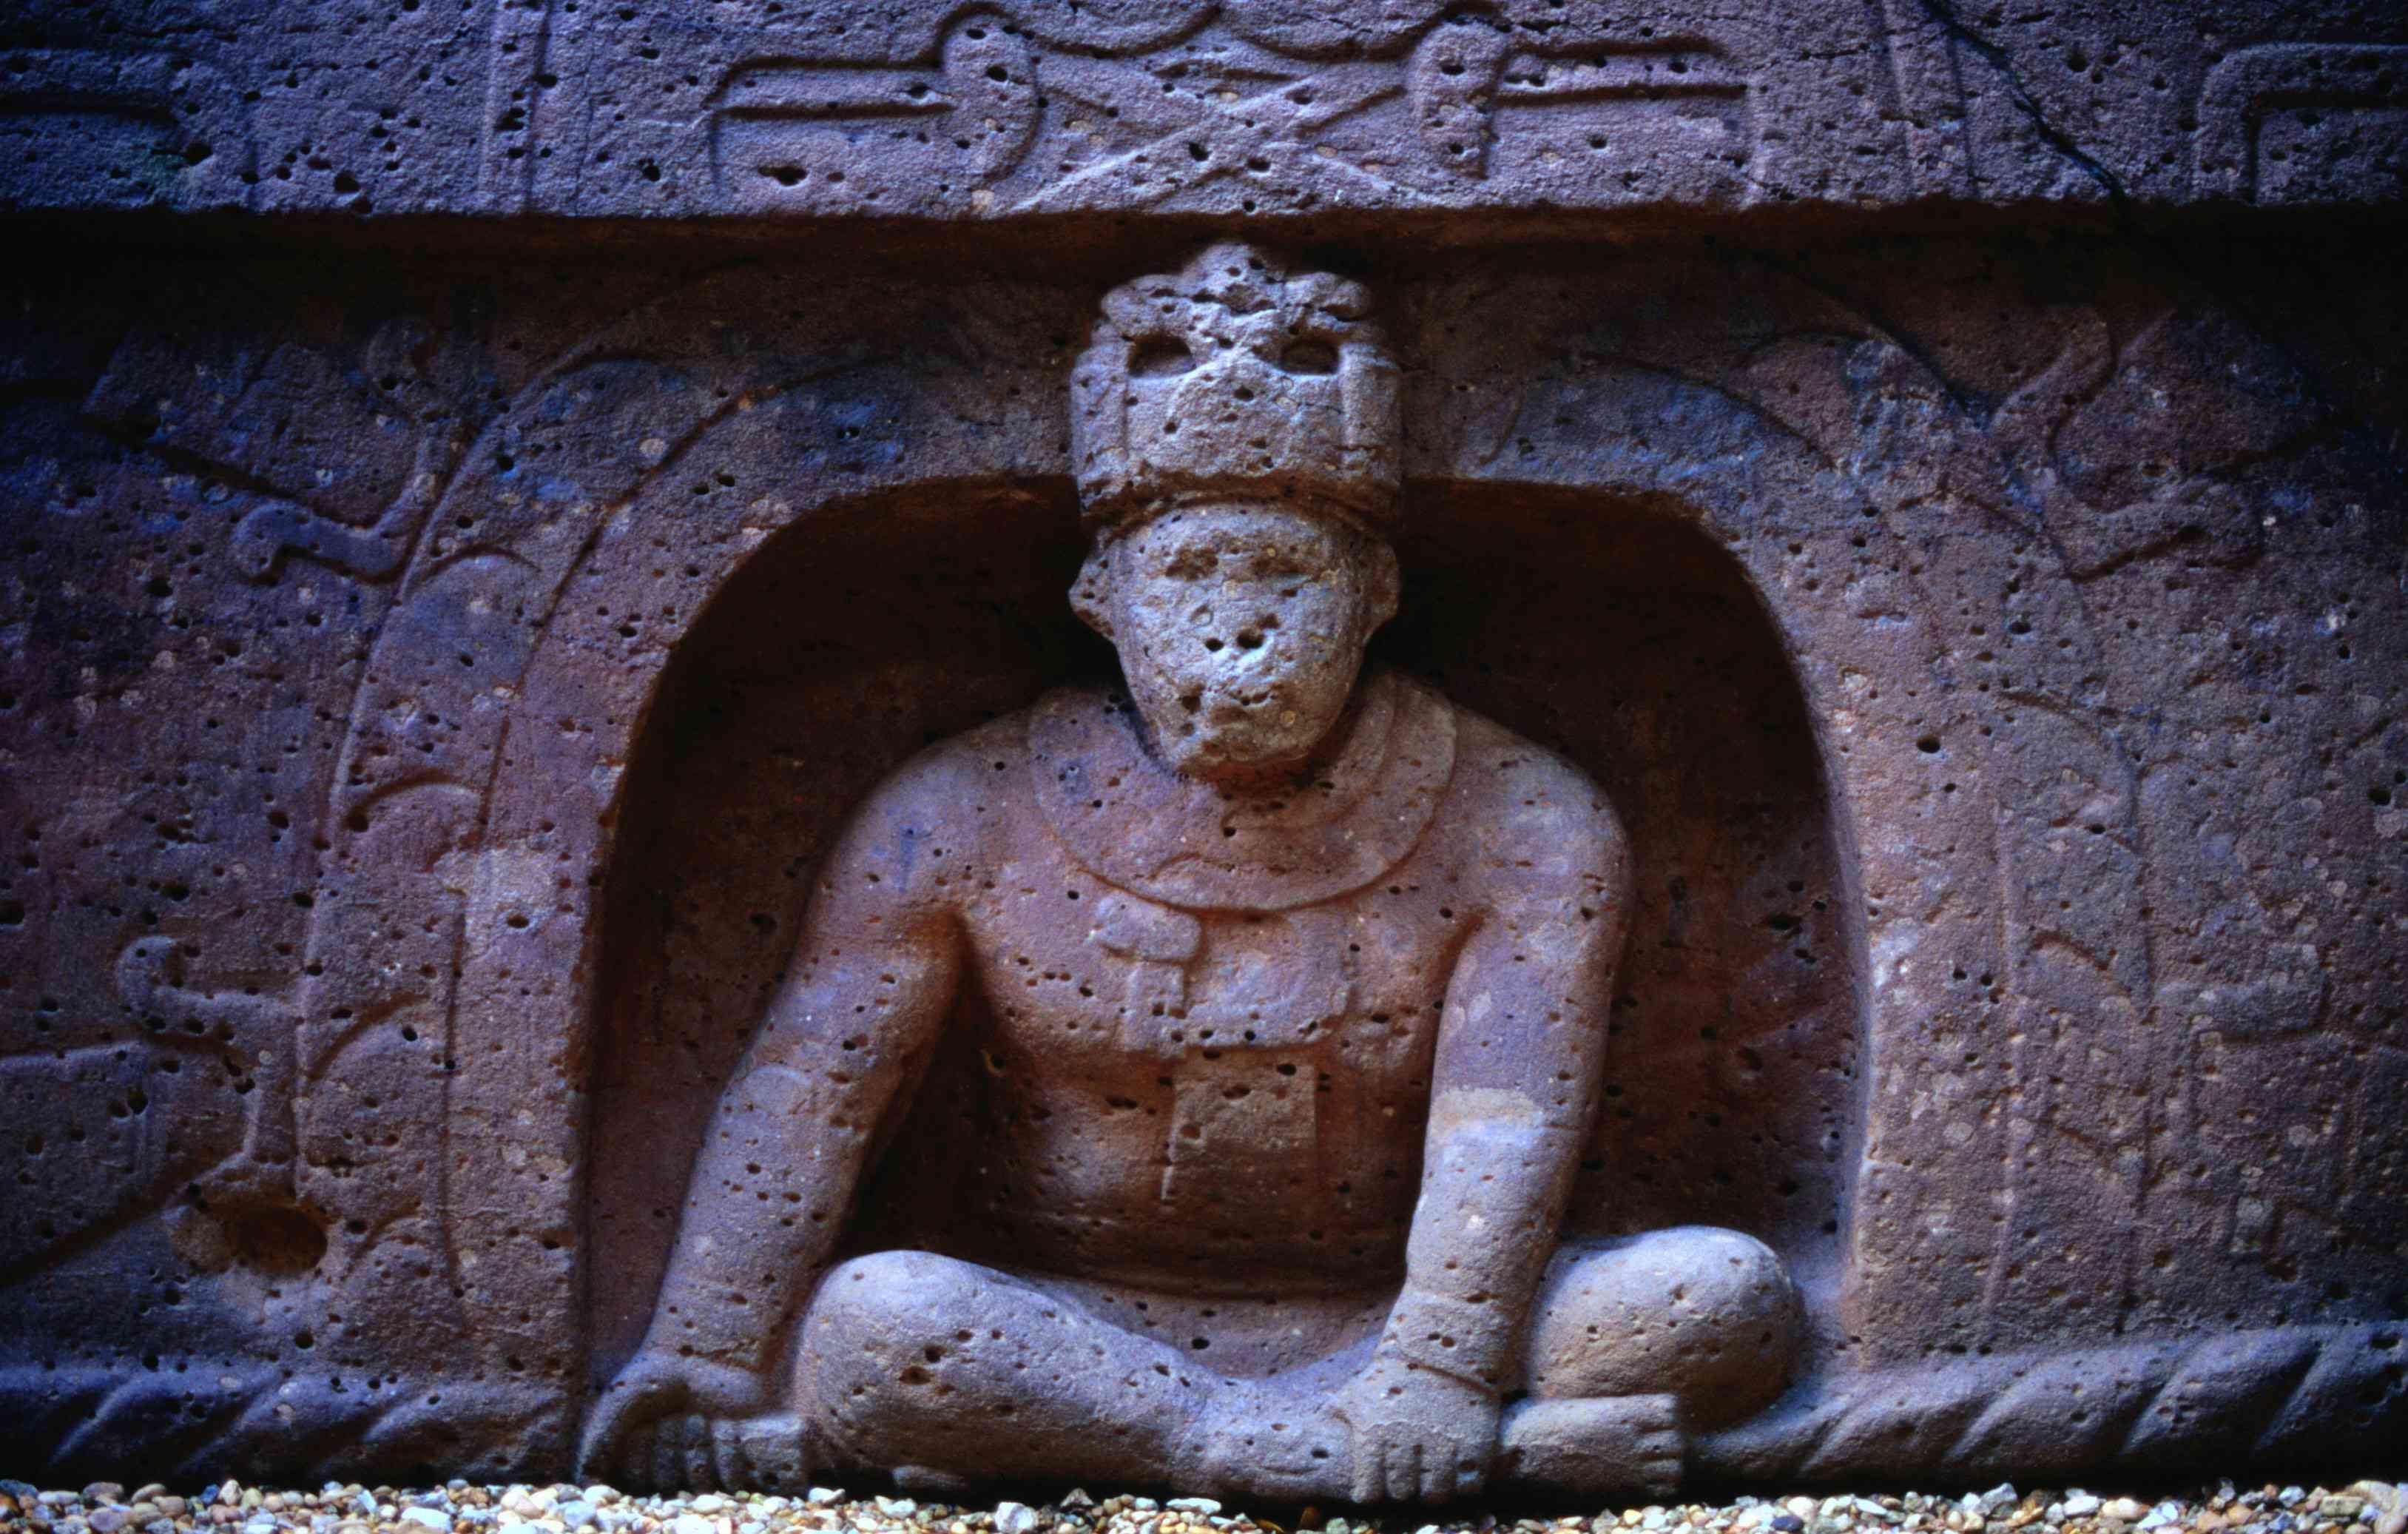 Sculpture of the Olmec Monkey God, at the City of La Venta, Mexico.